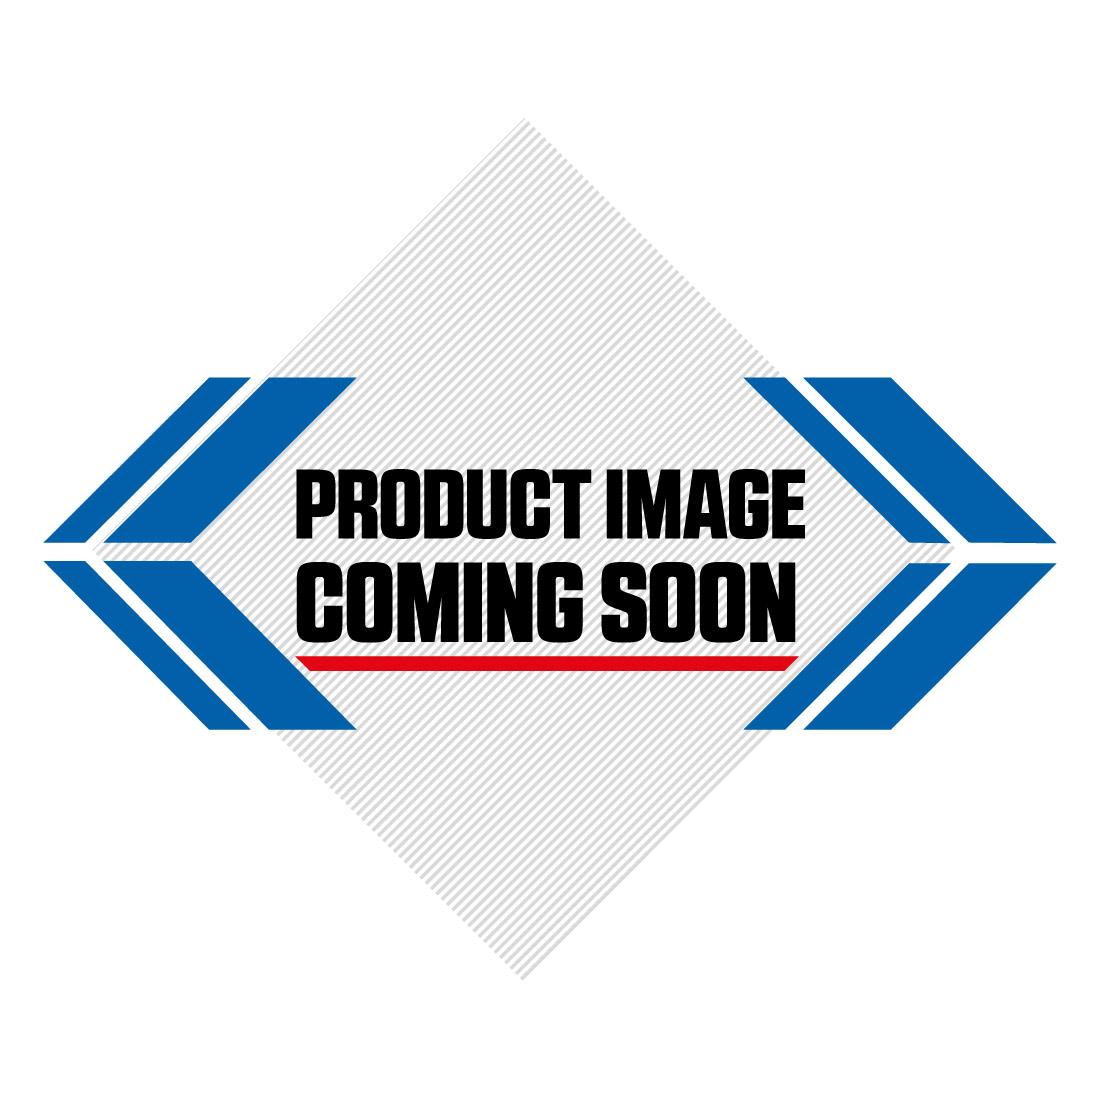 2018 Sidi Crossfire 3 SRS Cairoli Motocross Boots - Ltd Ed Yellow Flo White Image-2>